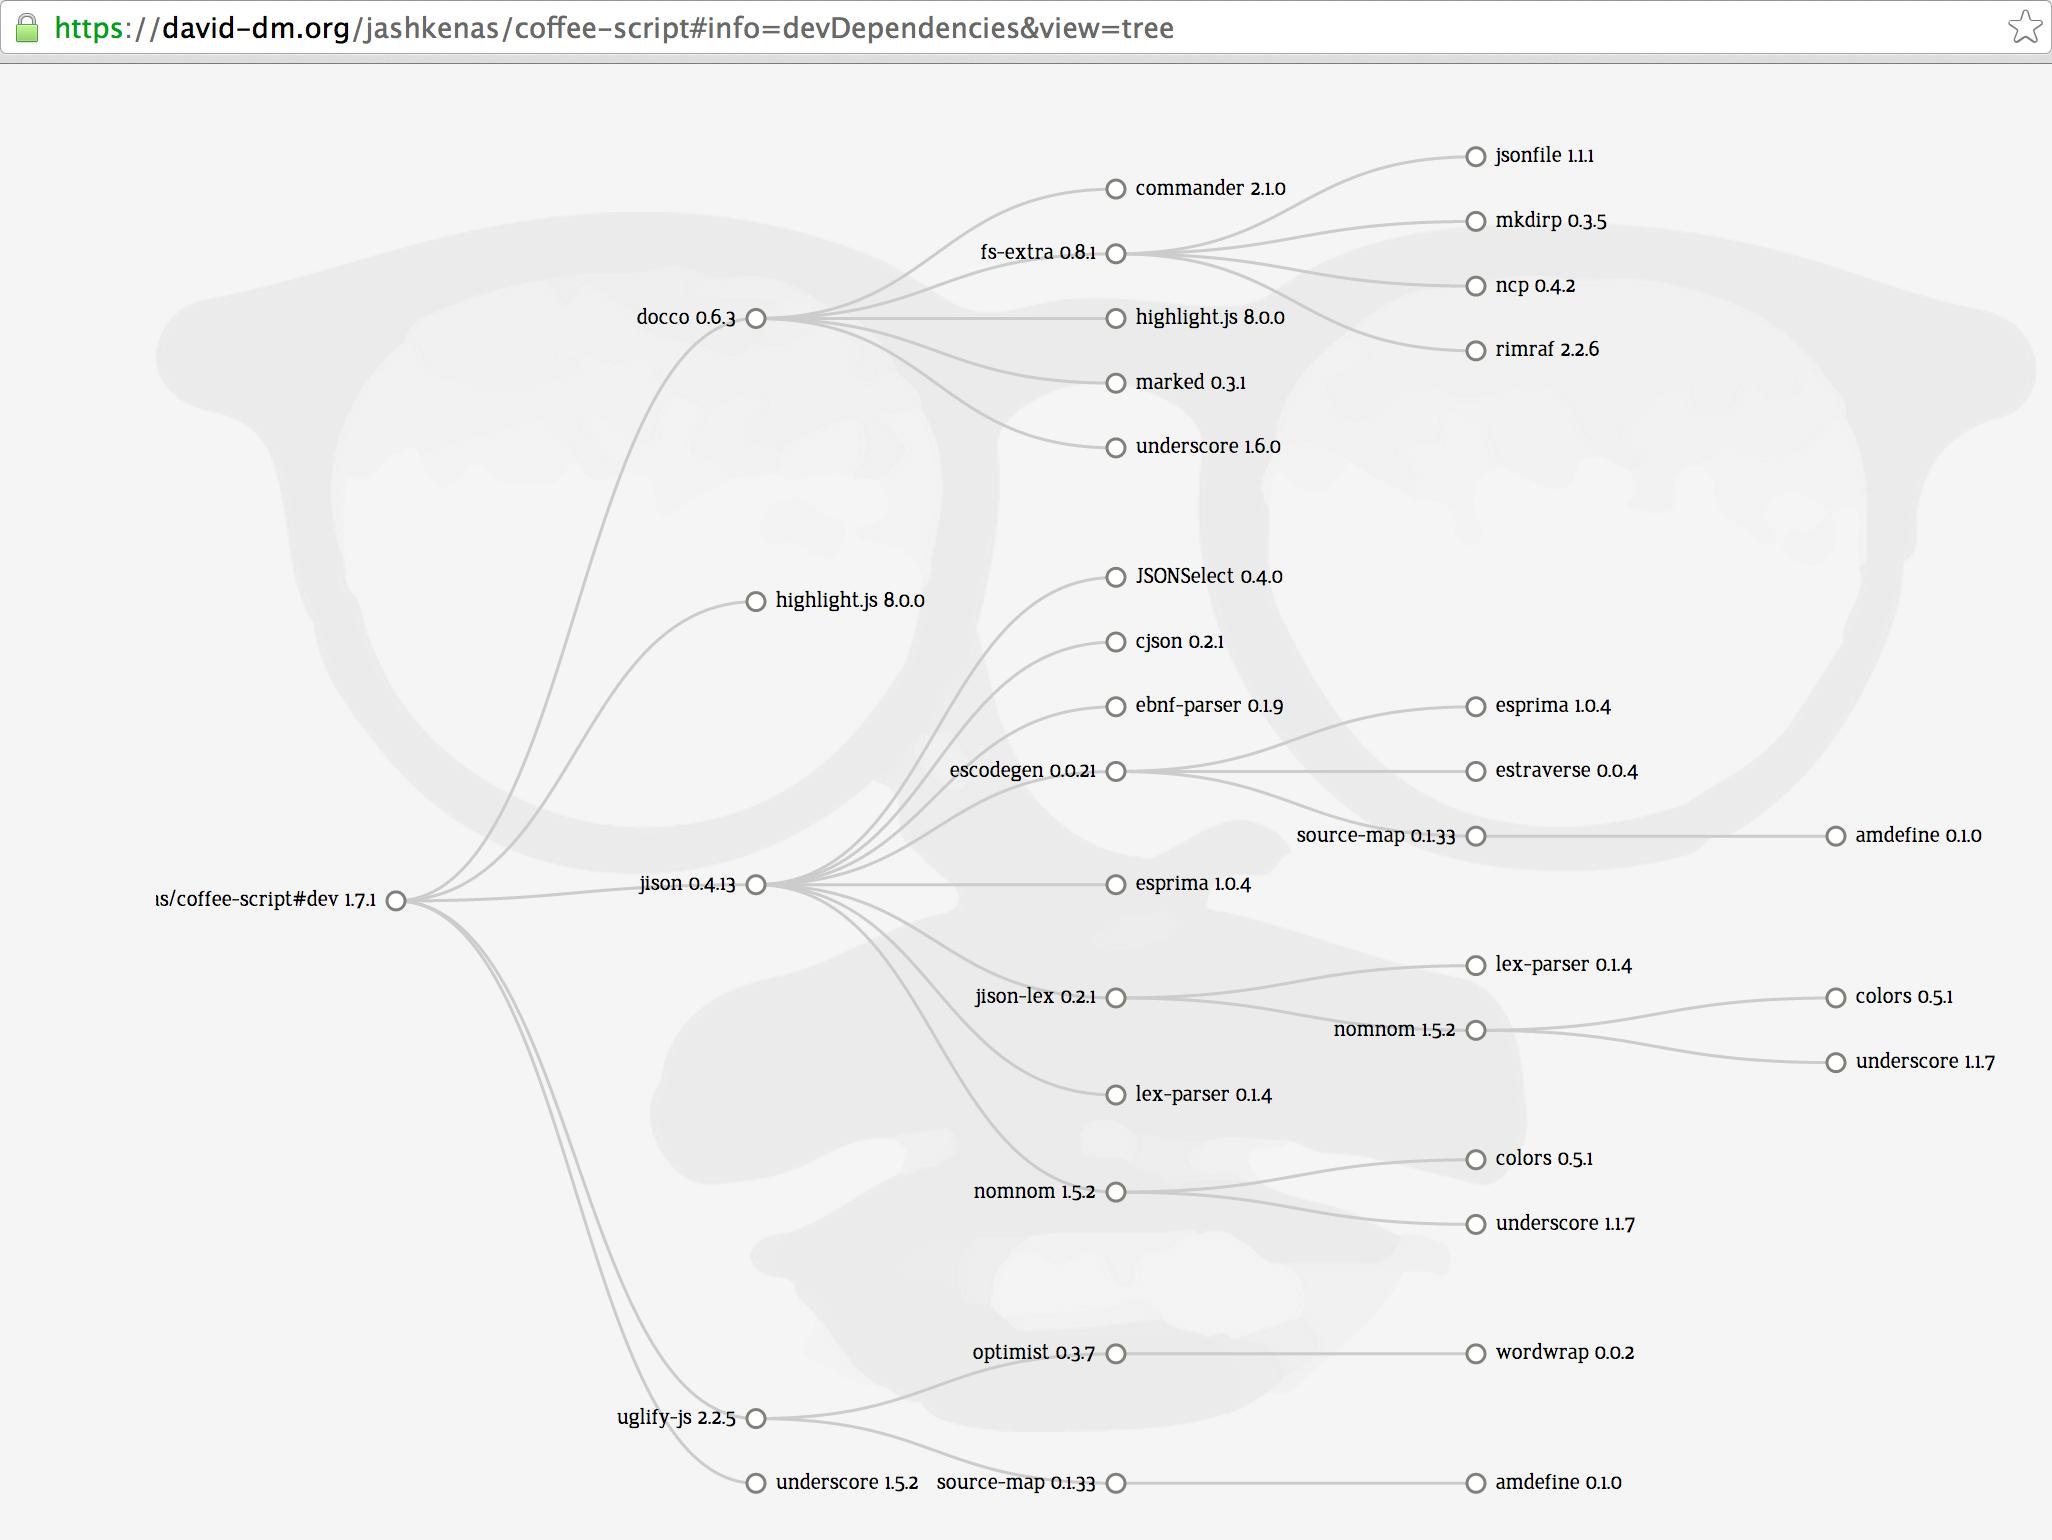 coffee-script dev dependencies fullscreen